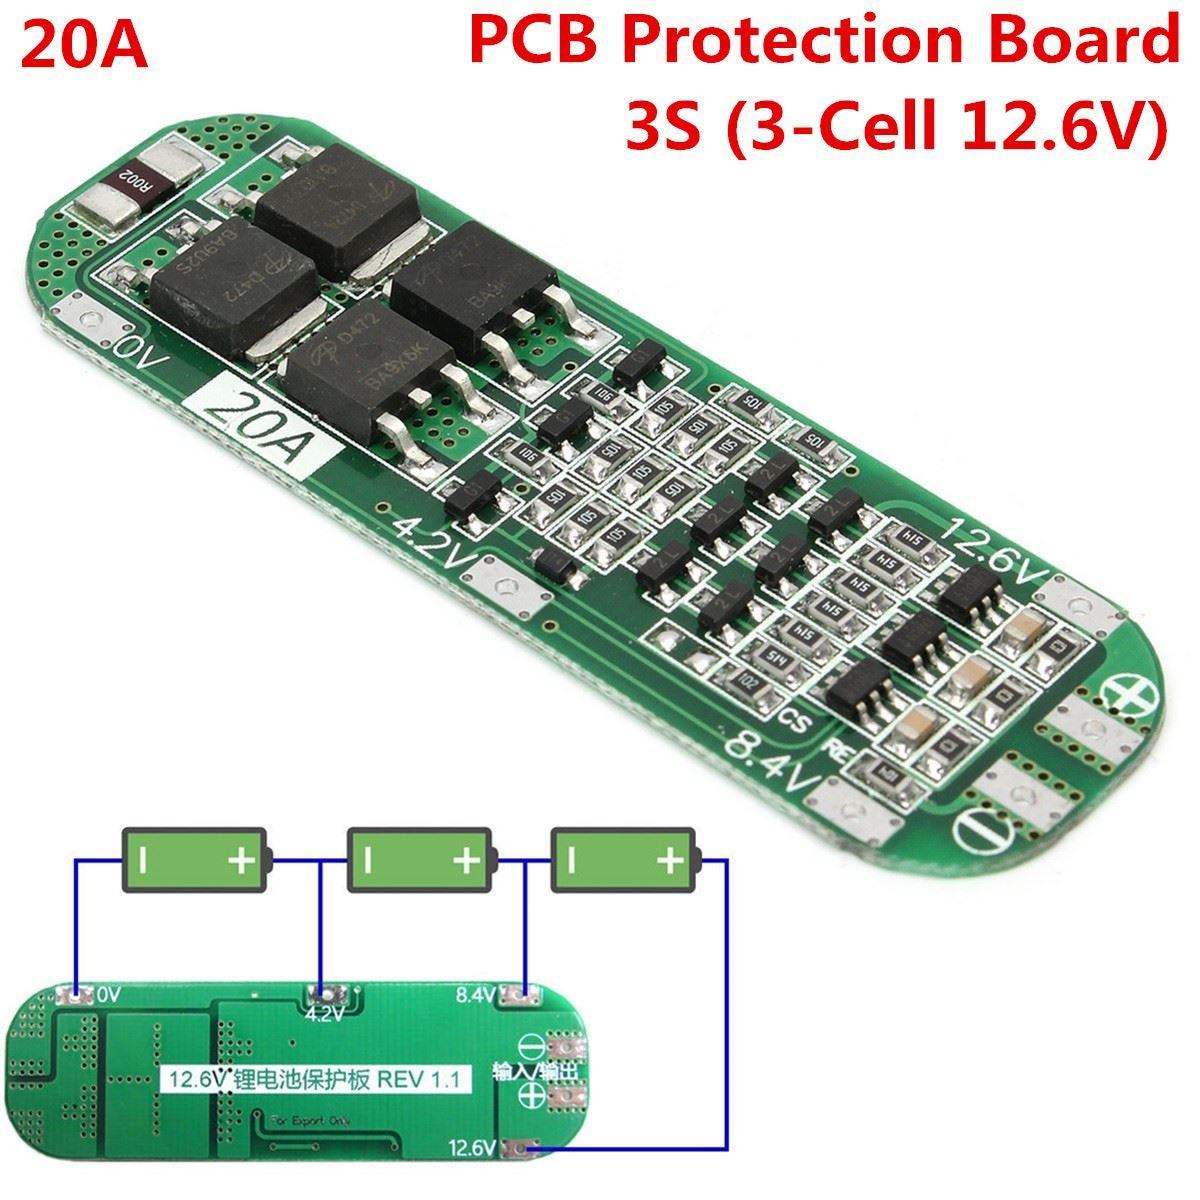 3S 20A Li-ion Lithium Batterie 18650 Ladegerät PCB BMS 12-6V Cell Schutz Board